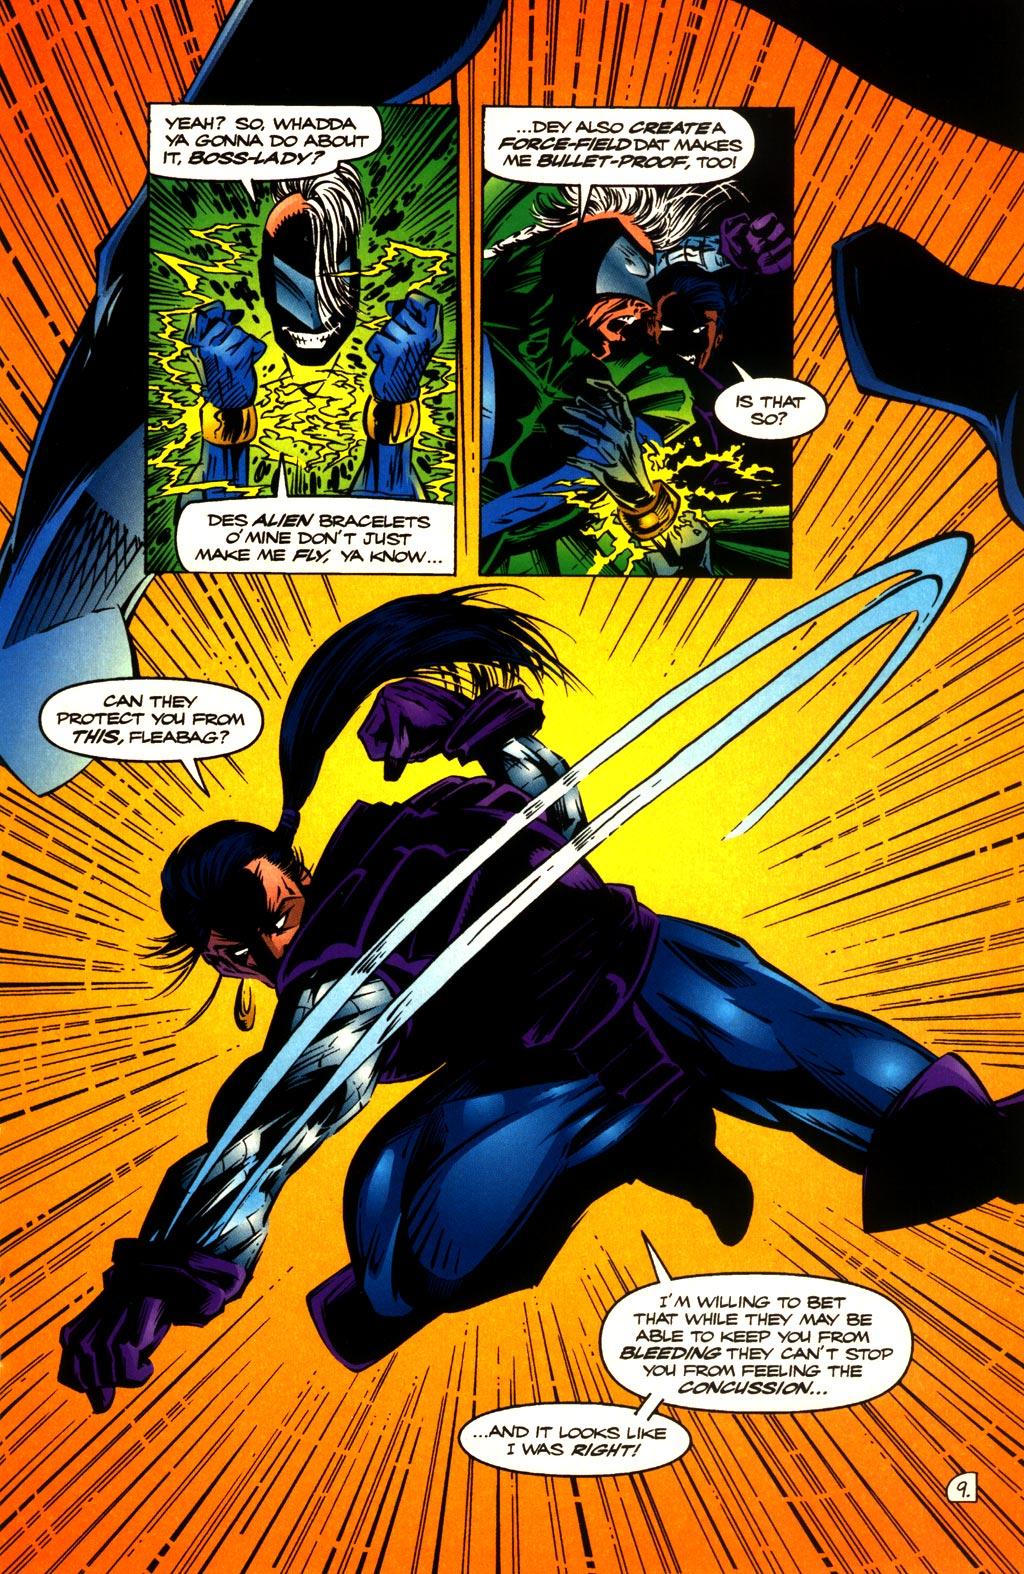 Read online ShadowHawk comic -  Issue #10 - 11